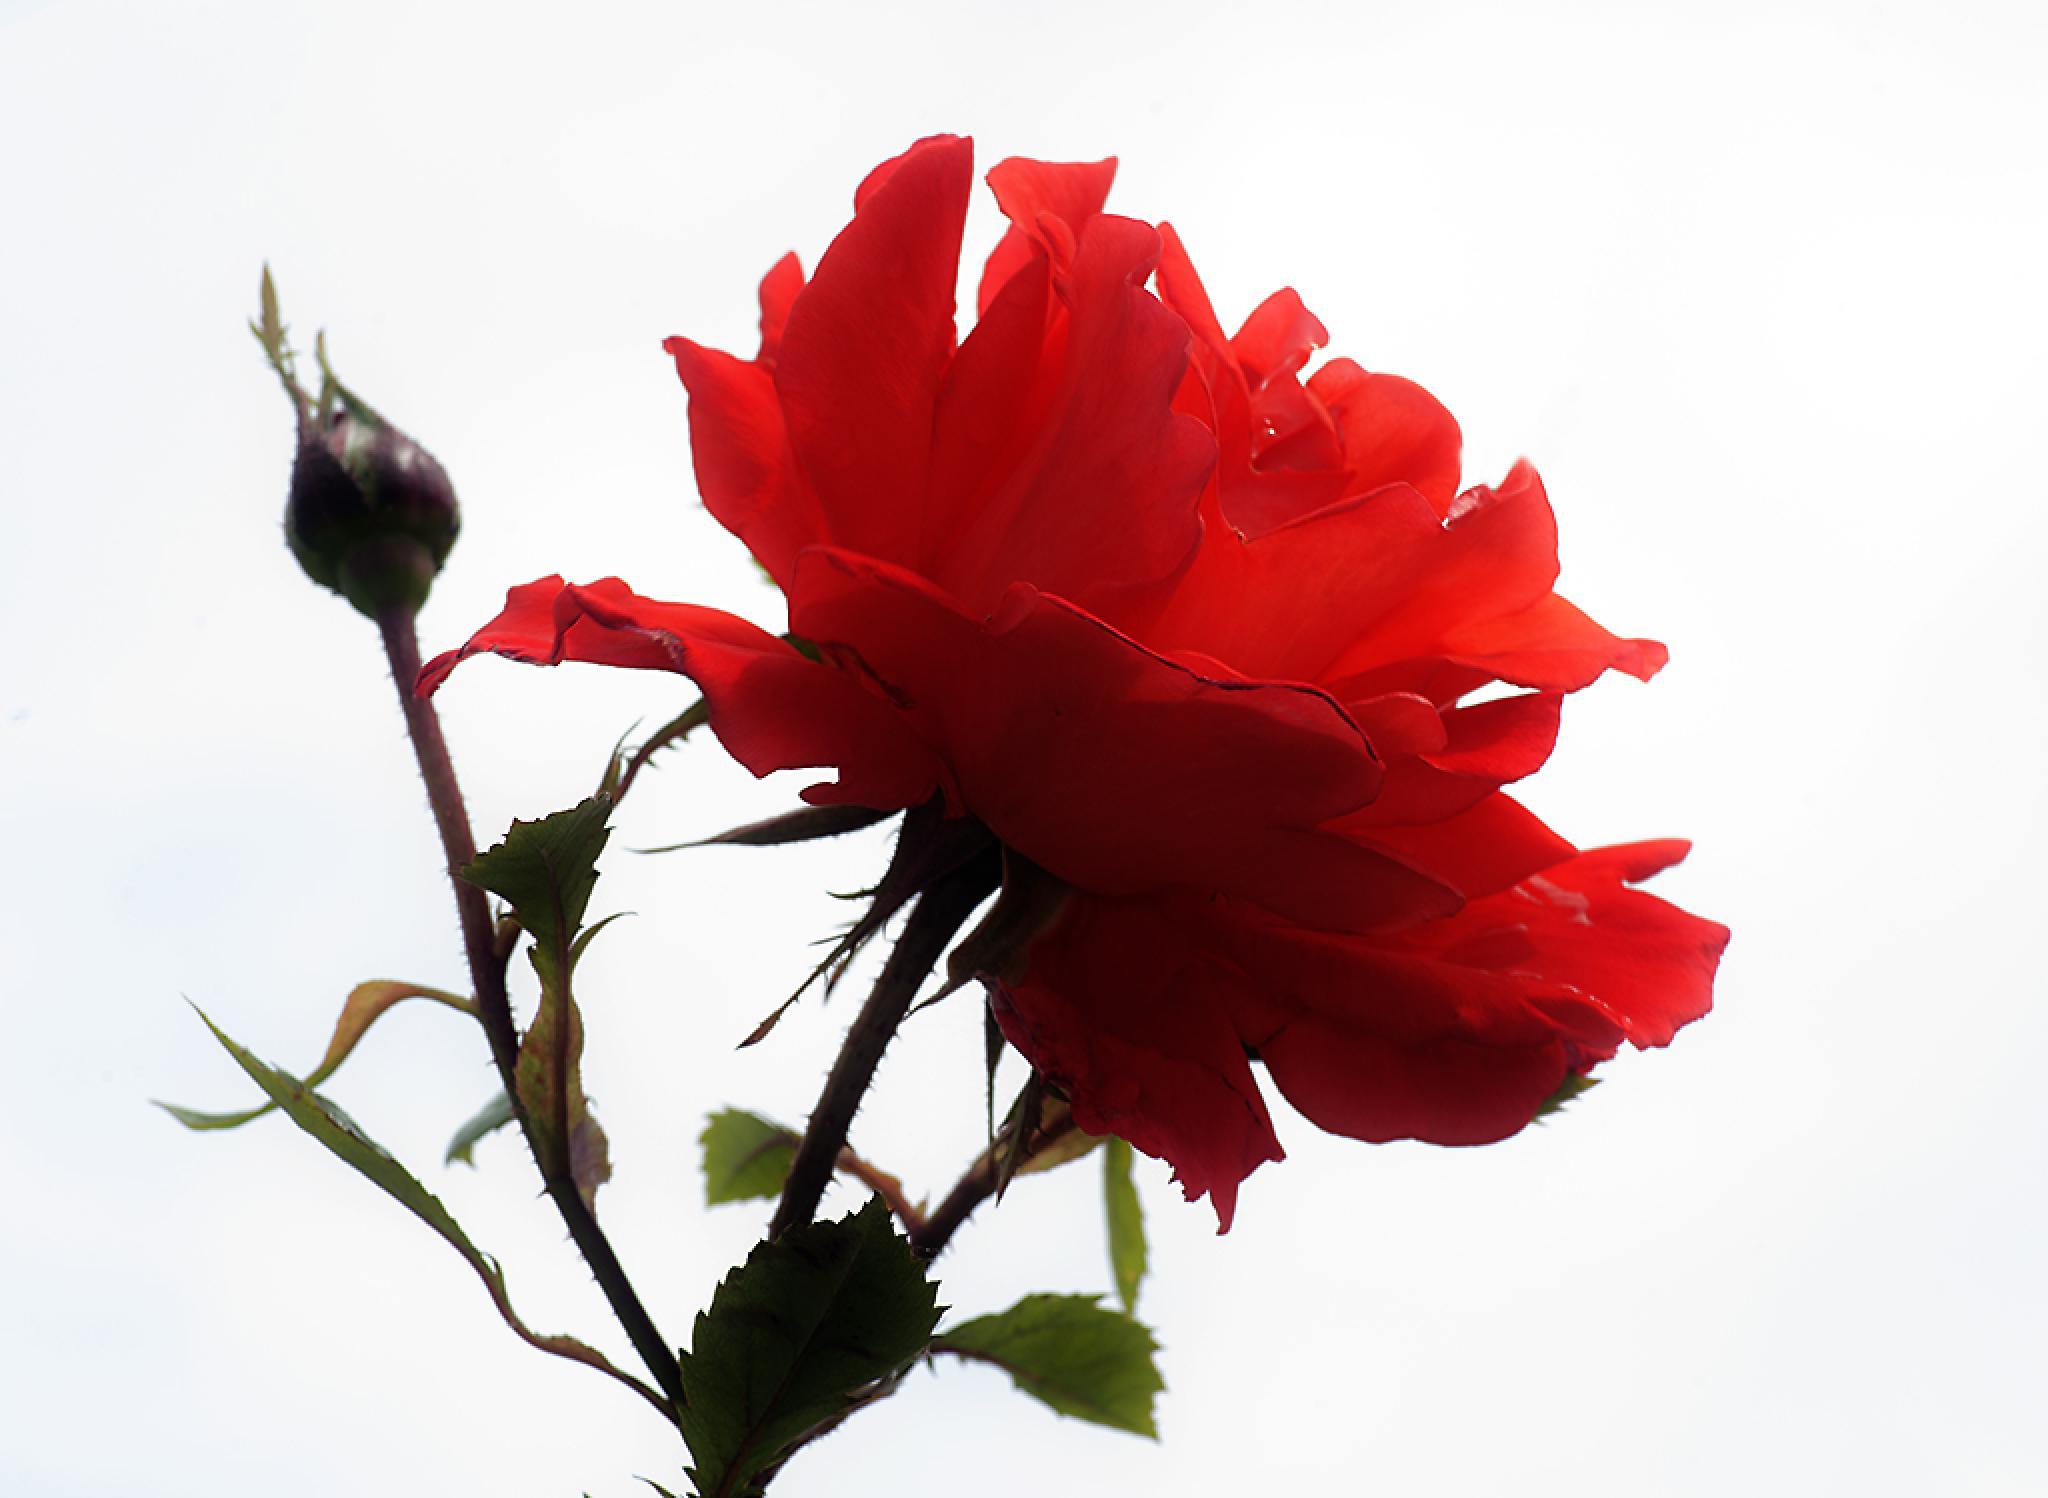 Rose by miloslaw.spiewak